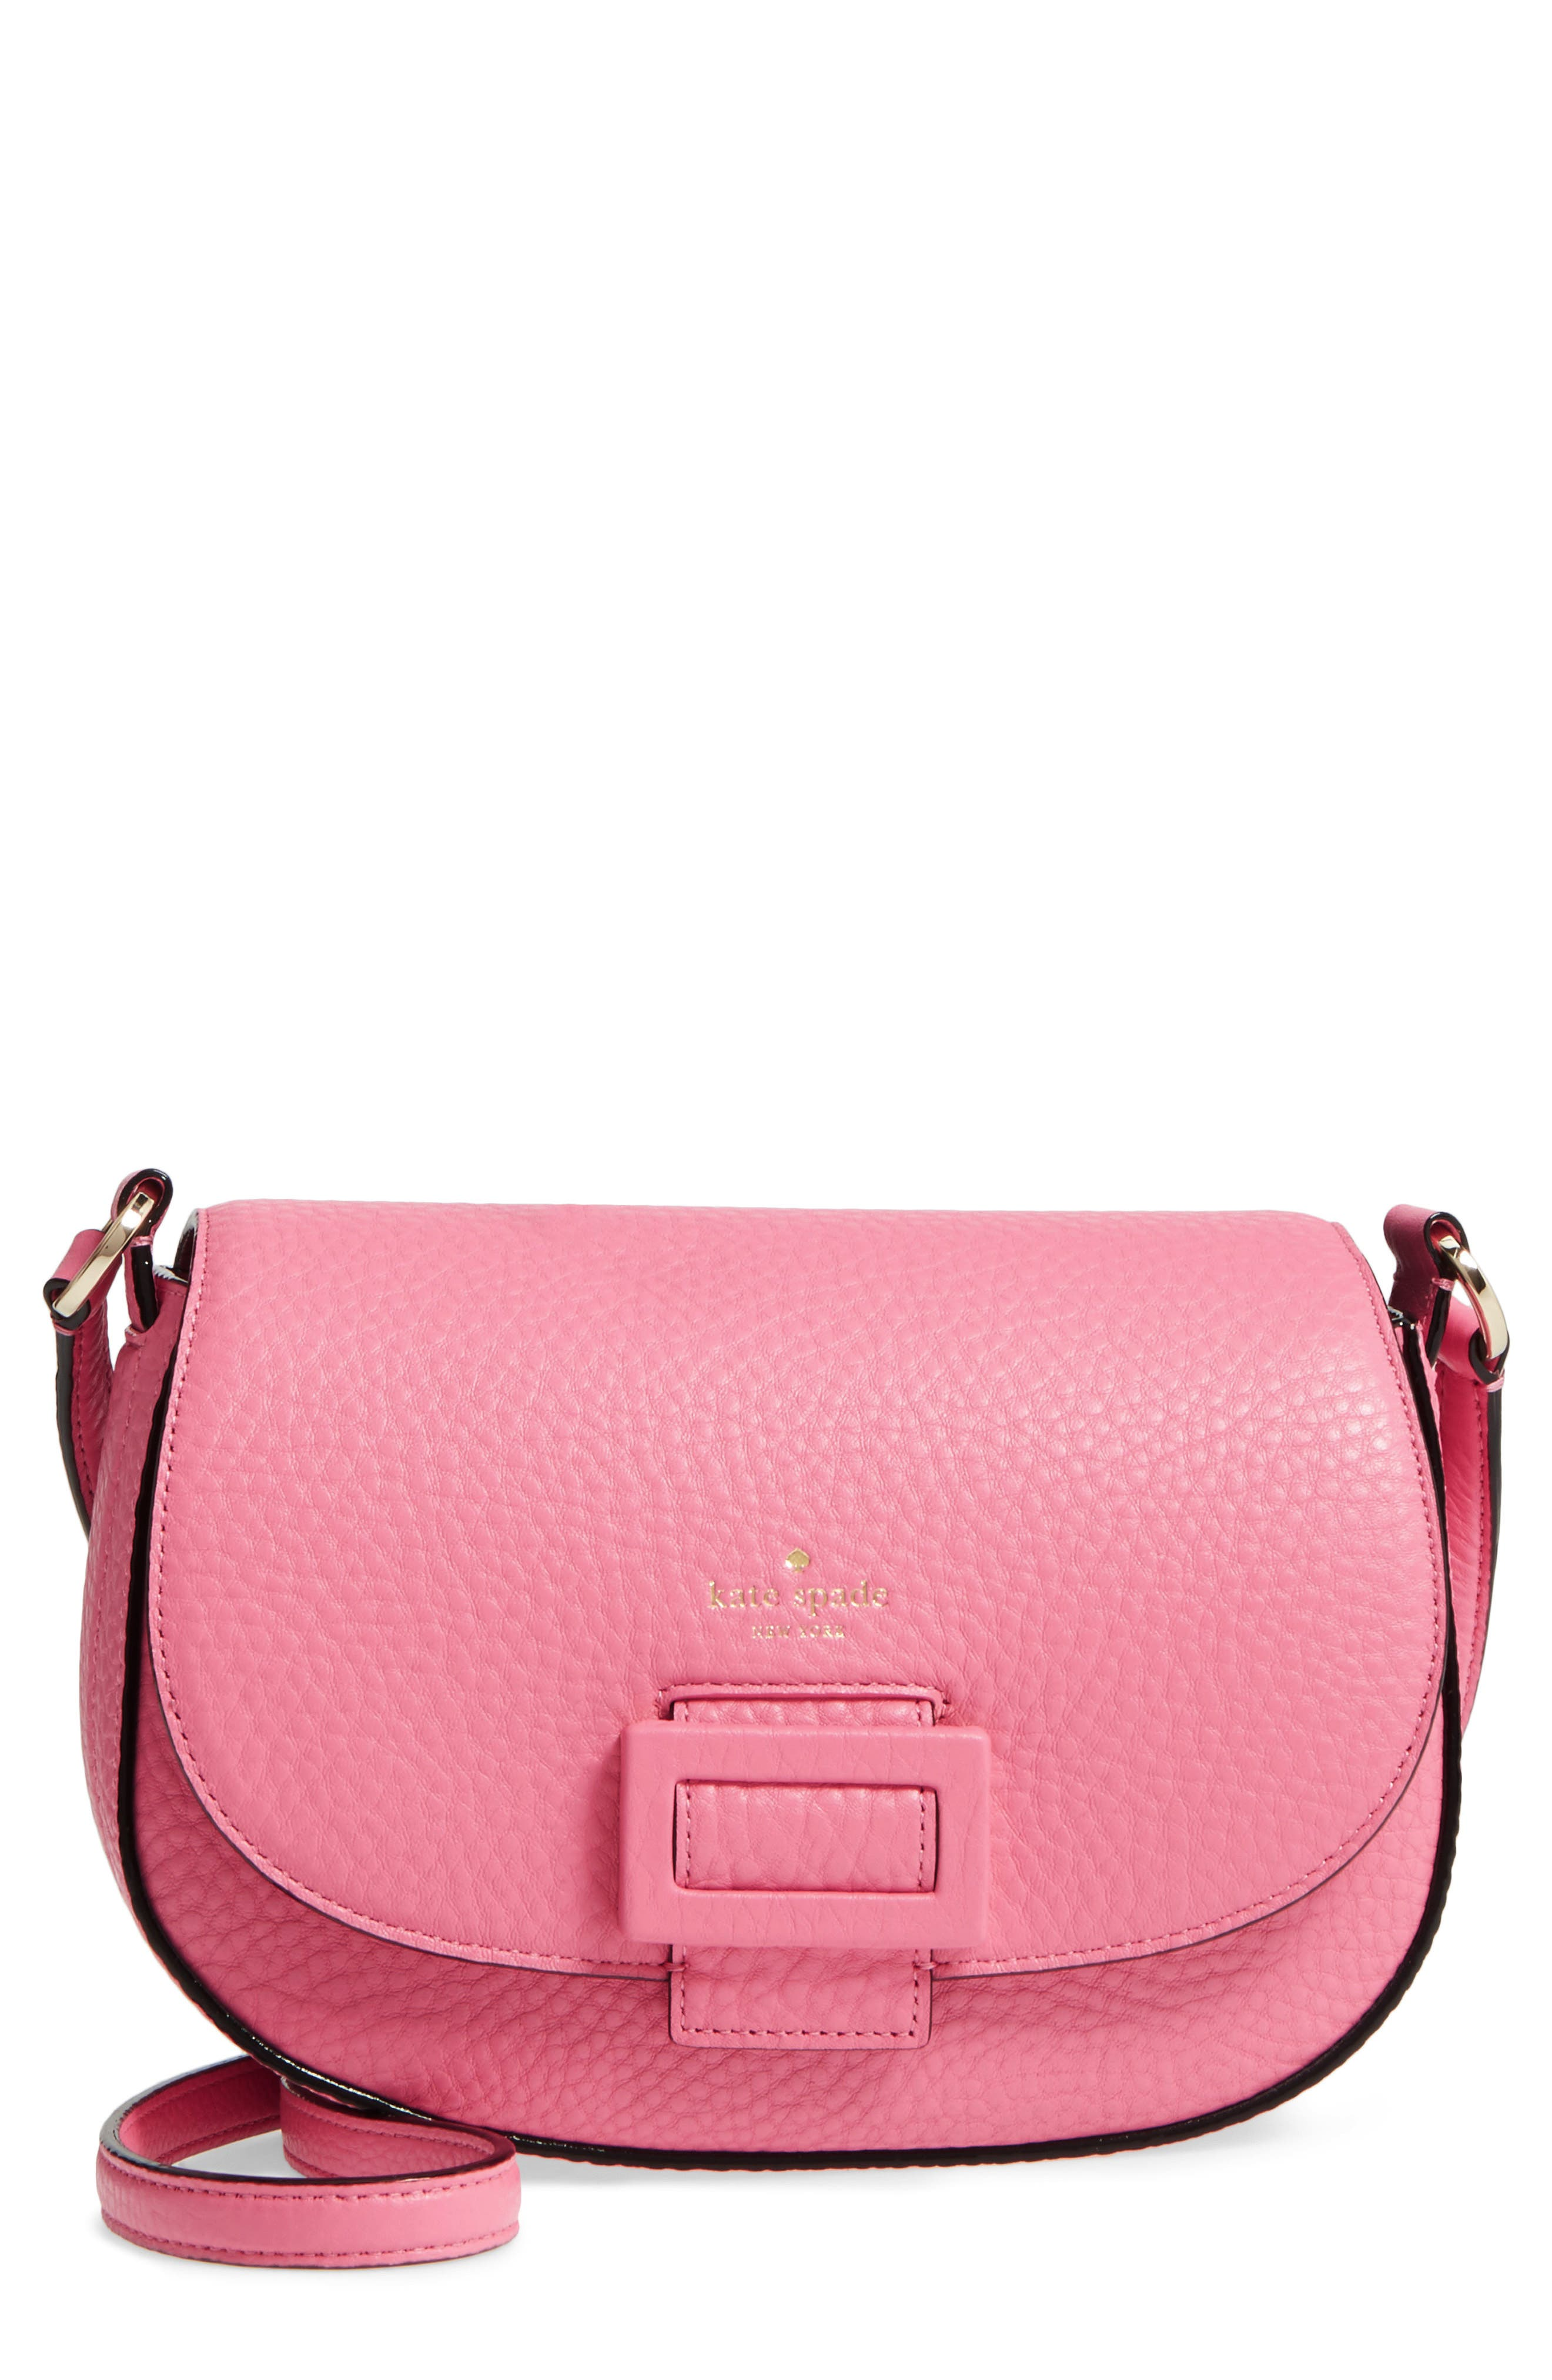 carlyle street - kallie leather saddle bag,                             Main thumbnail 3, color,